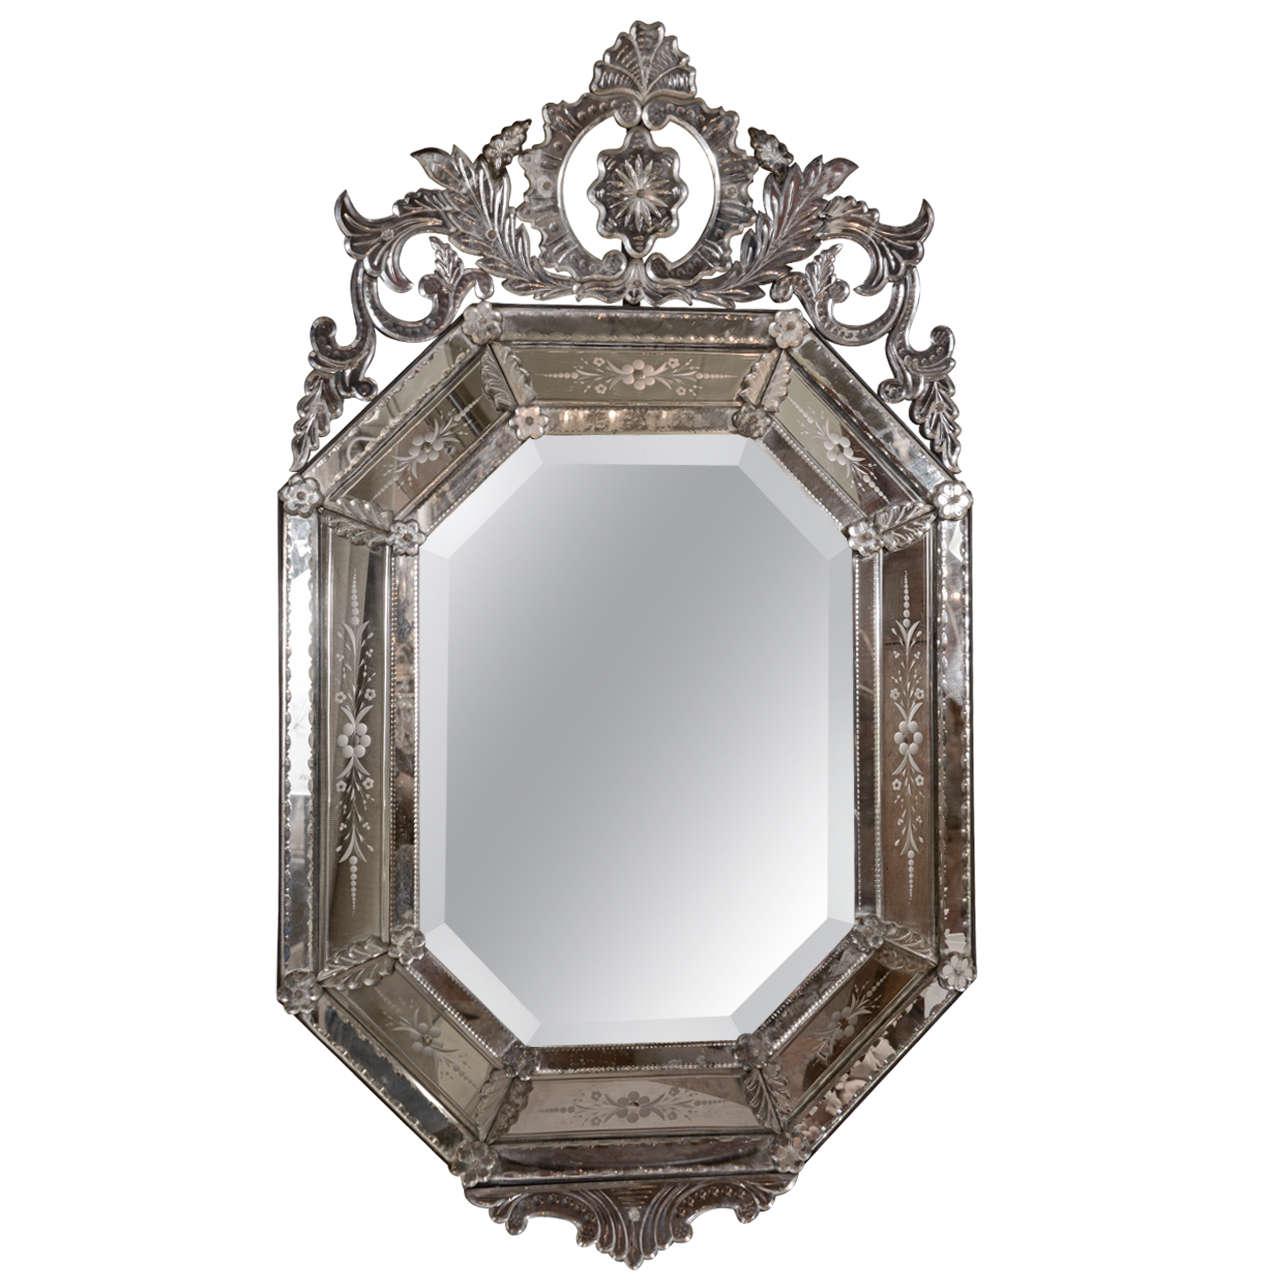 Octagonal venetian mirror at 1stdibs for Black venetian mirror